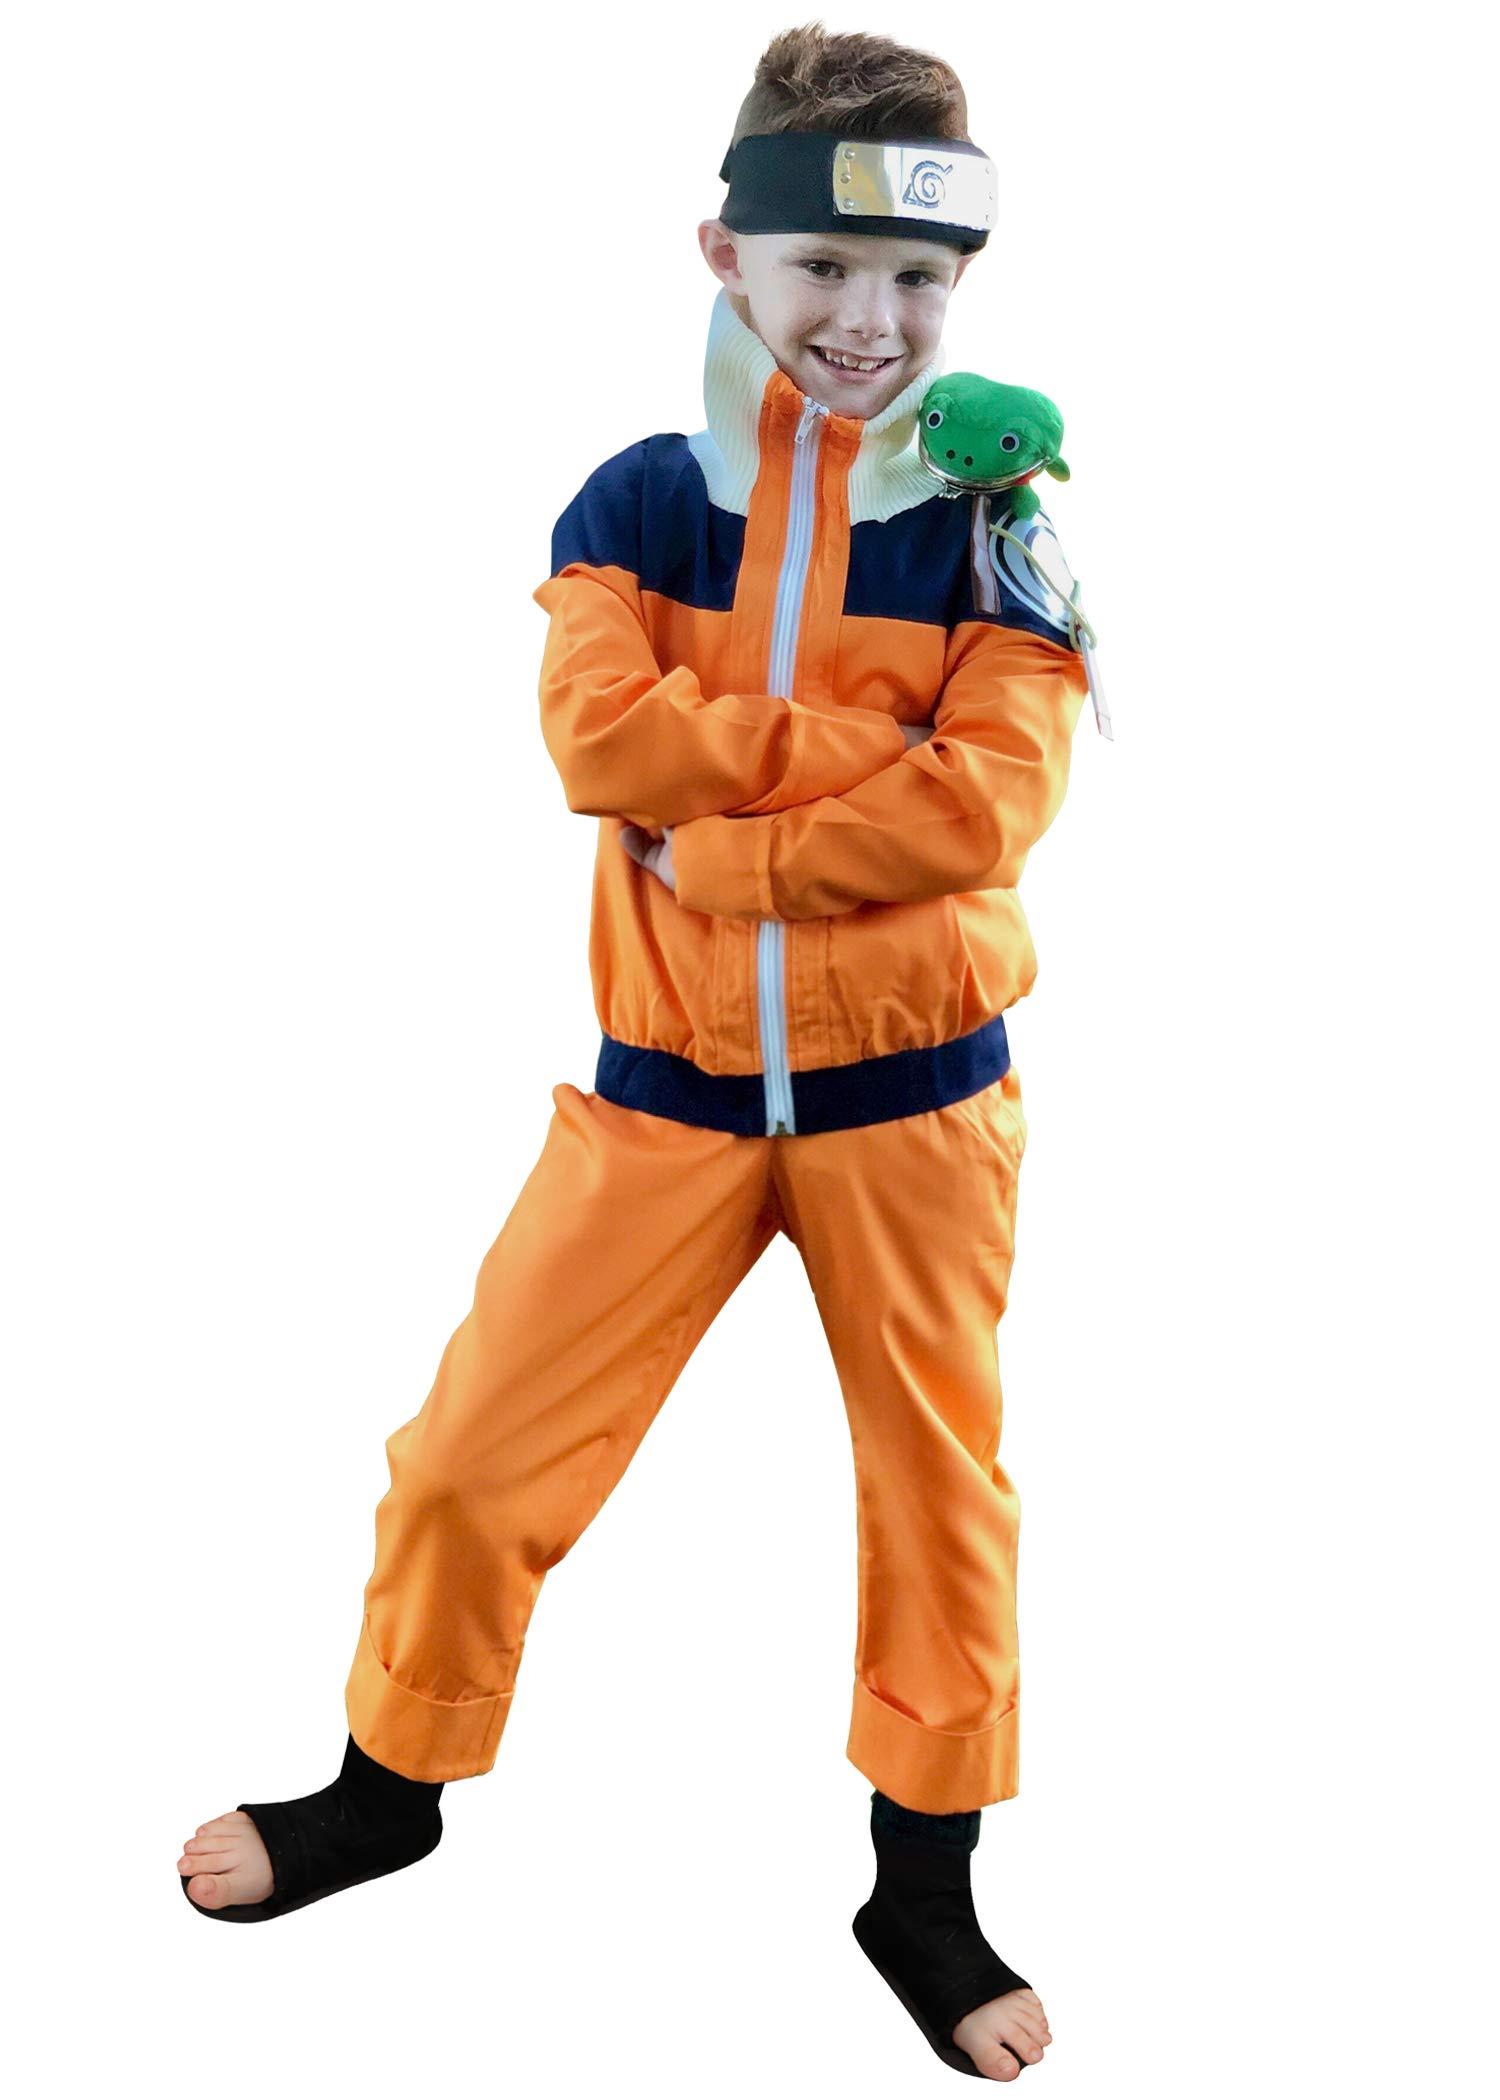 DAZCOS Child Size for Uzumaki Shippuuden Kids Cosplay Costume